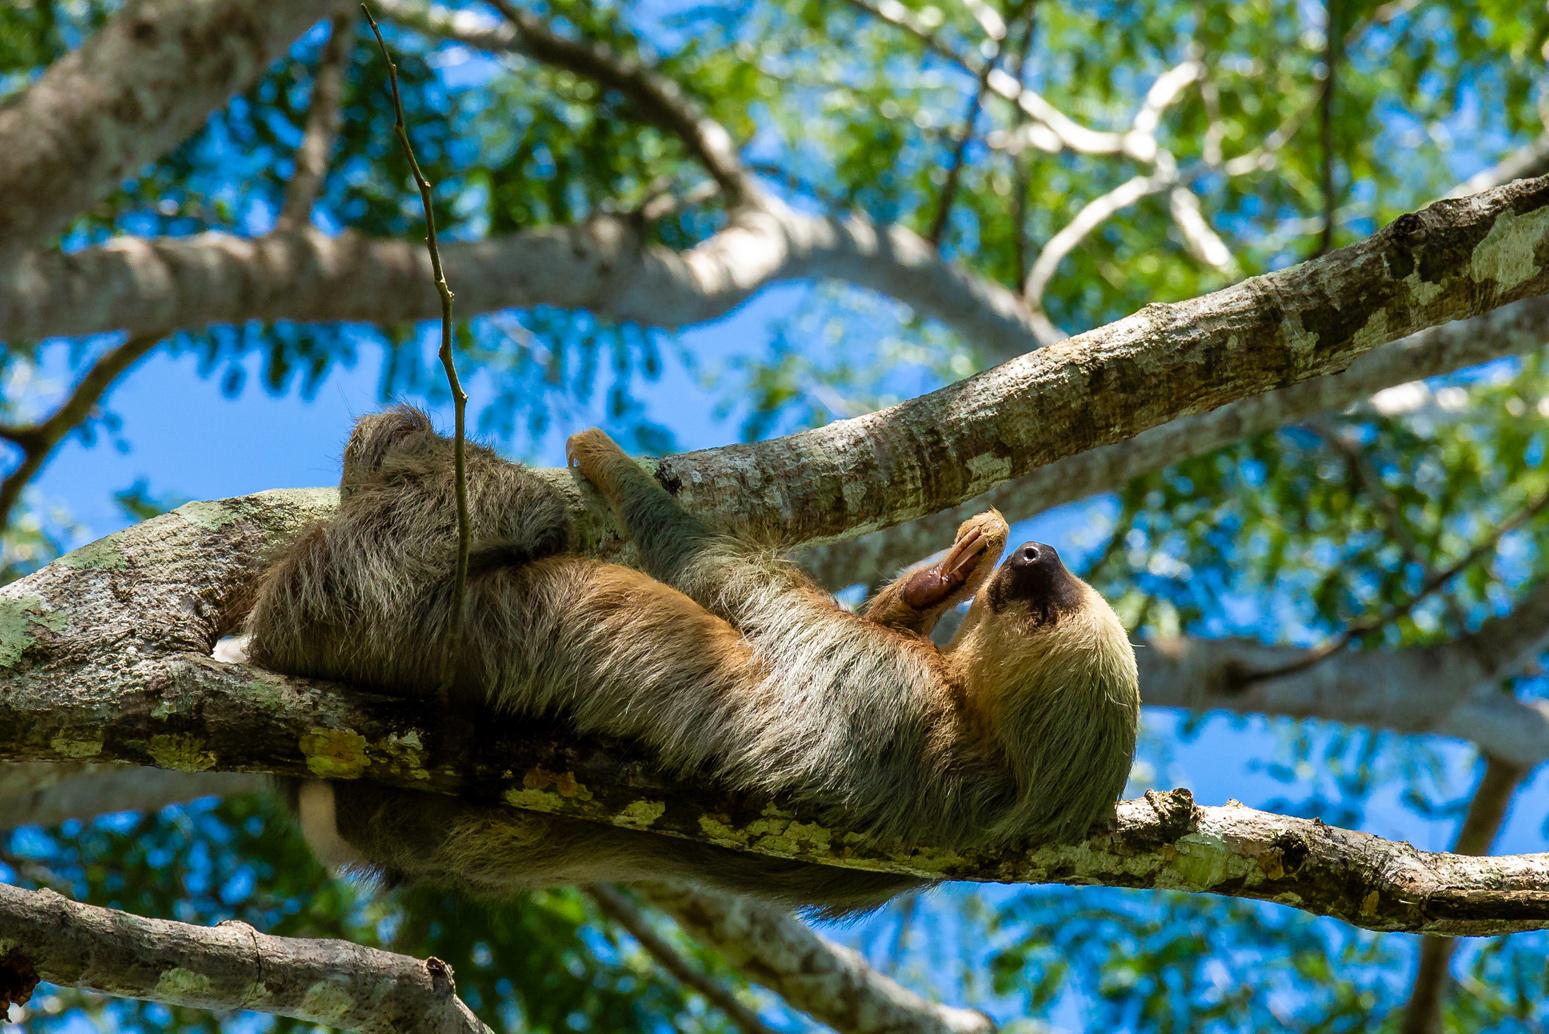 Two toed sloth - Osa Peninsula